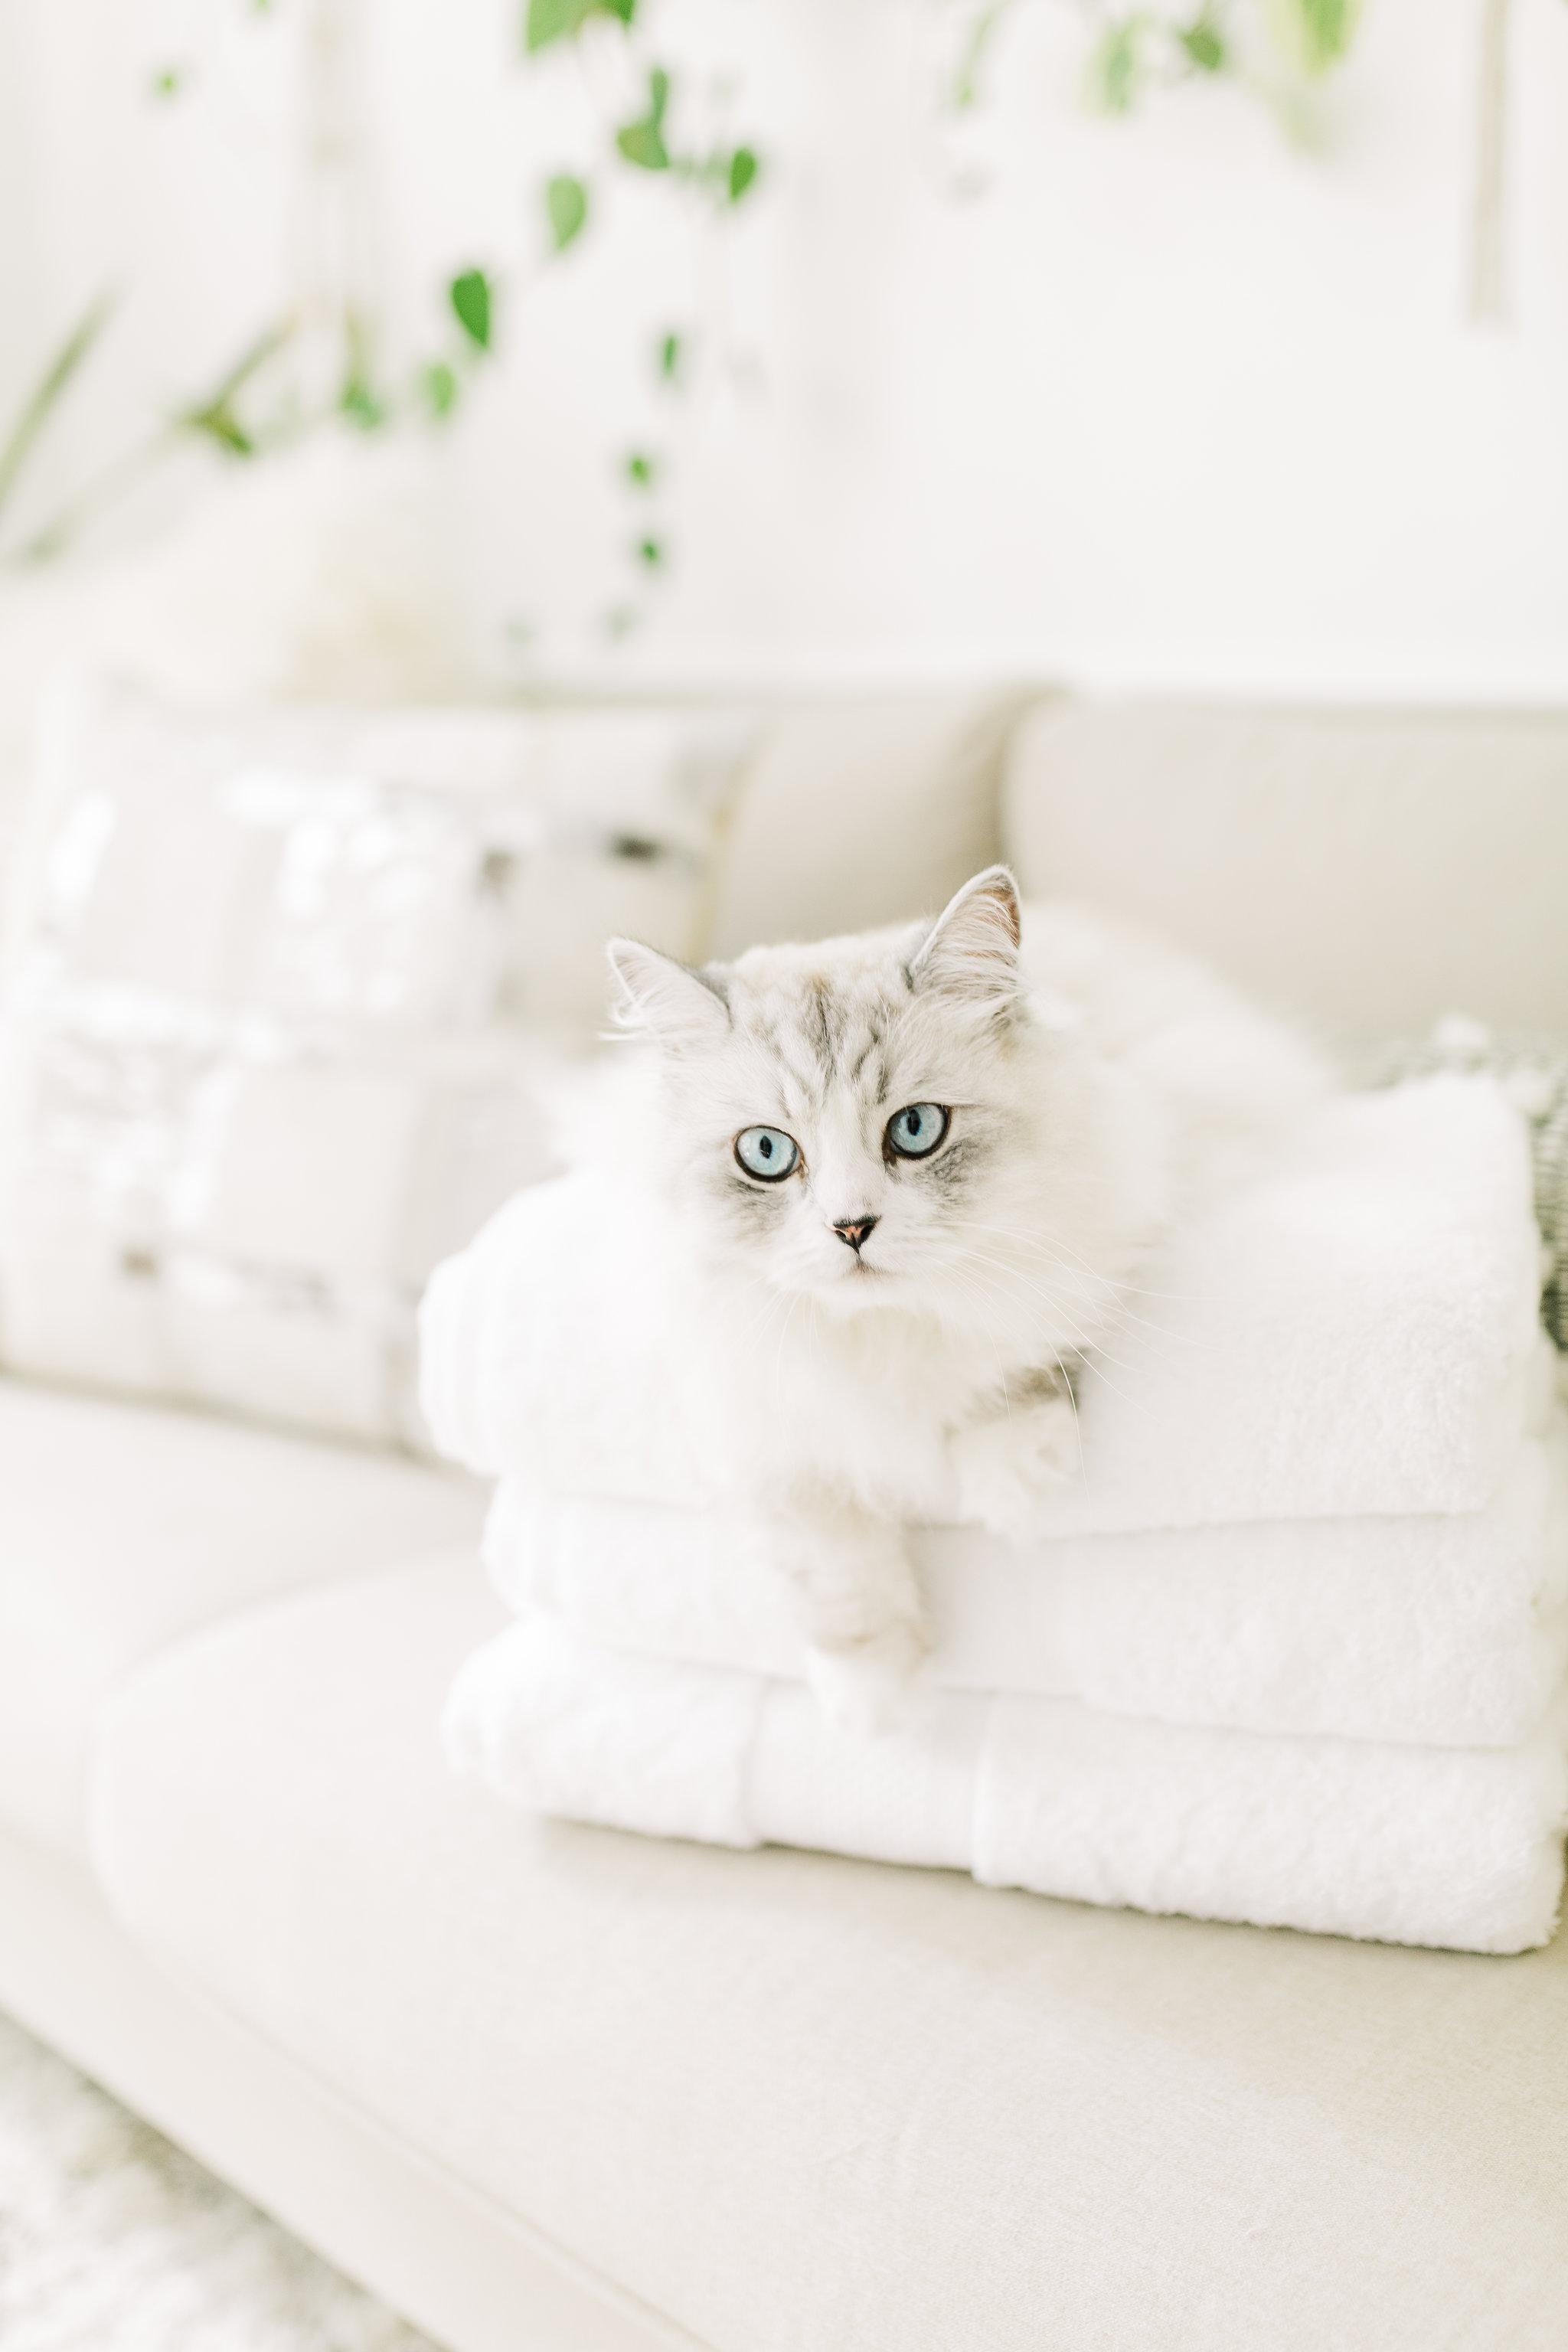 Joyfullygreen The Company Store Legends Sterling Bath Towels Cat Lady.jpg